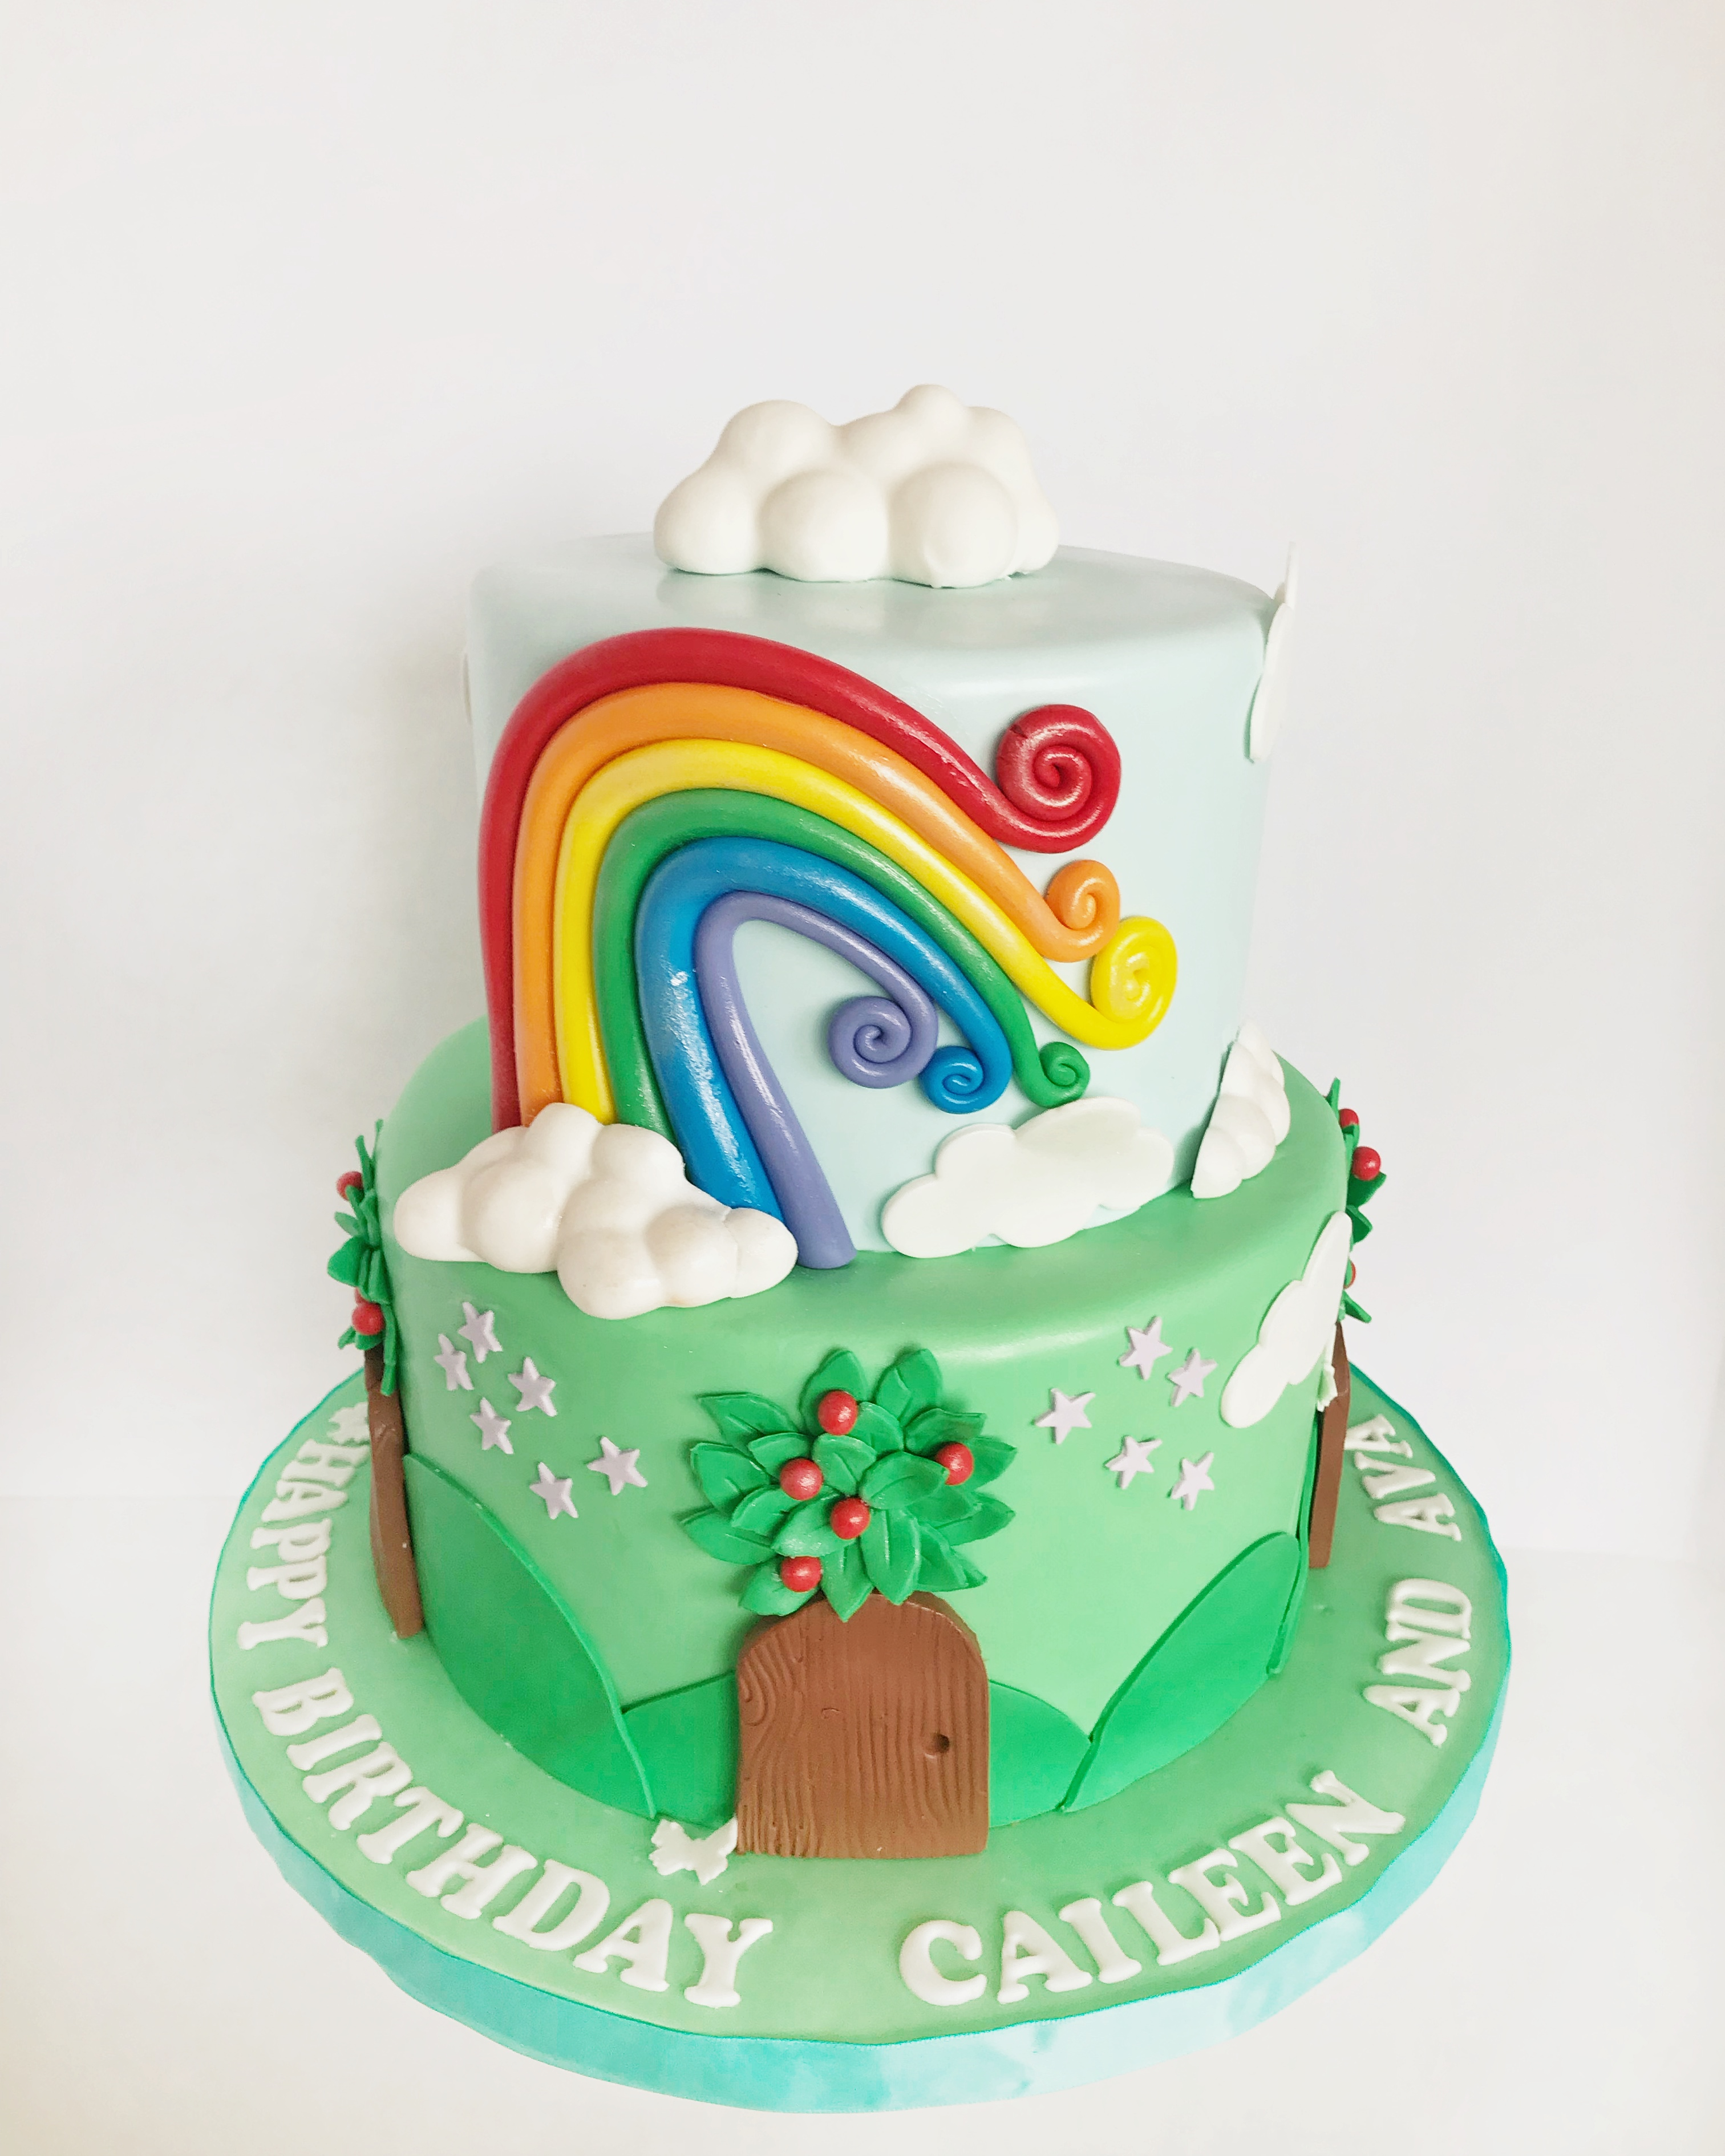 Rianbow cake